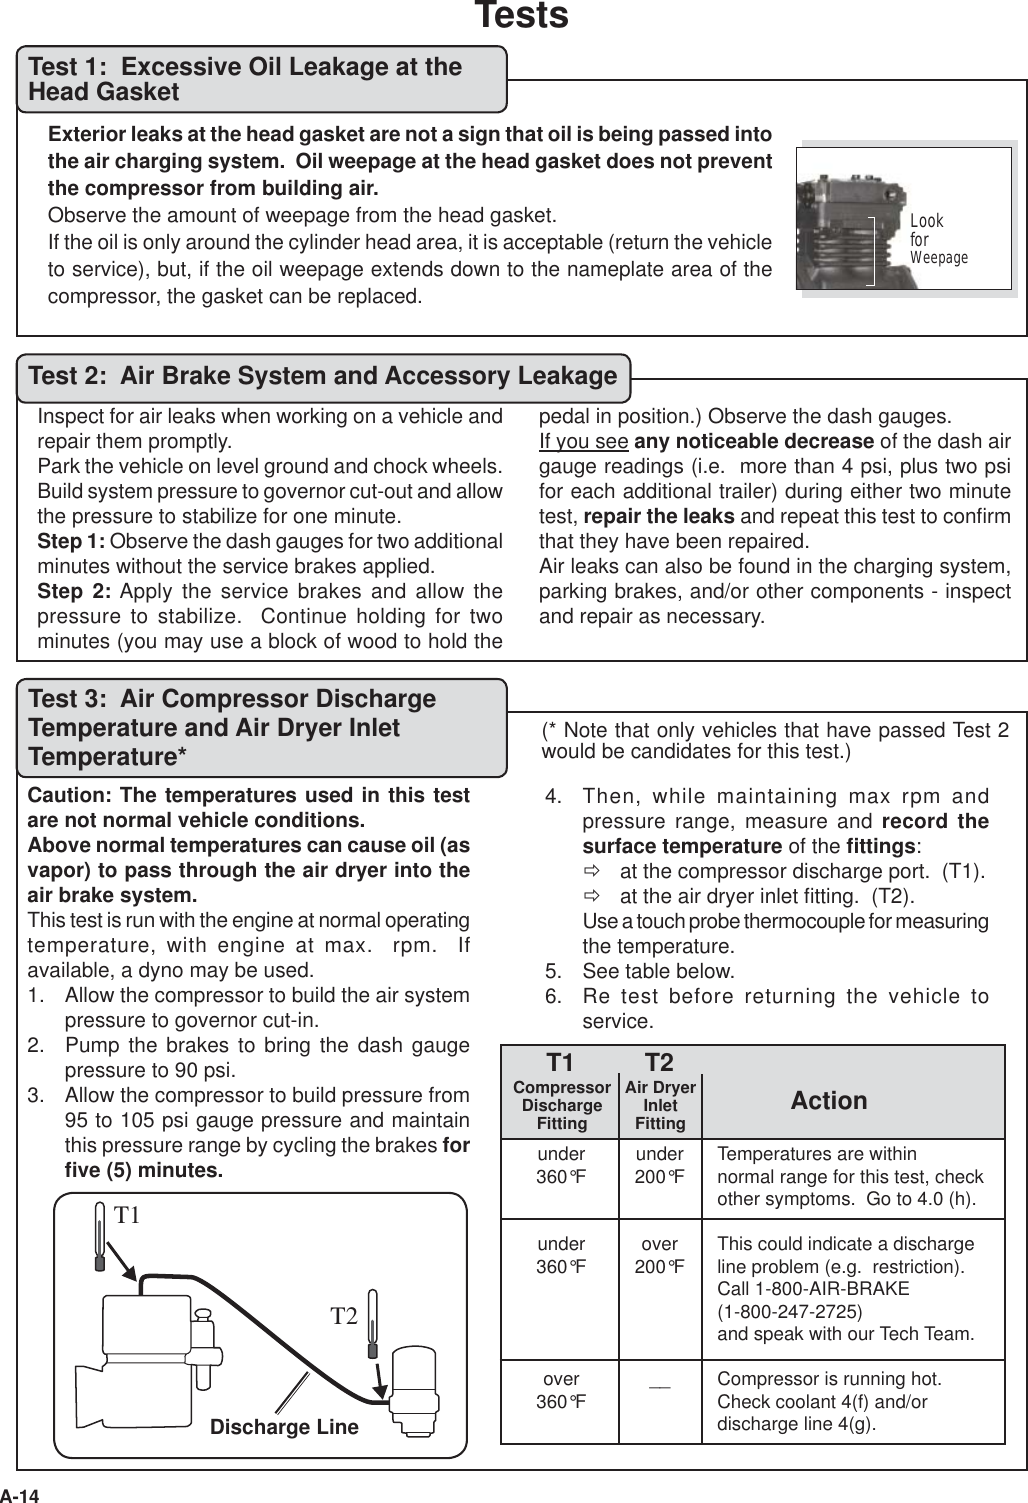 Bendix Tu Flo 550 Compressor Users Manual ManualsLib Makes It Easy